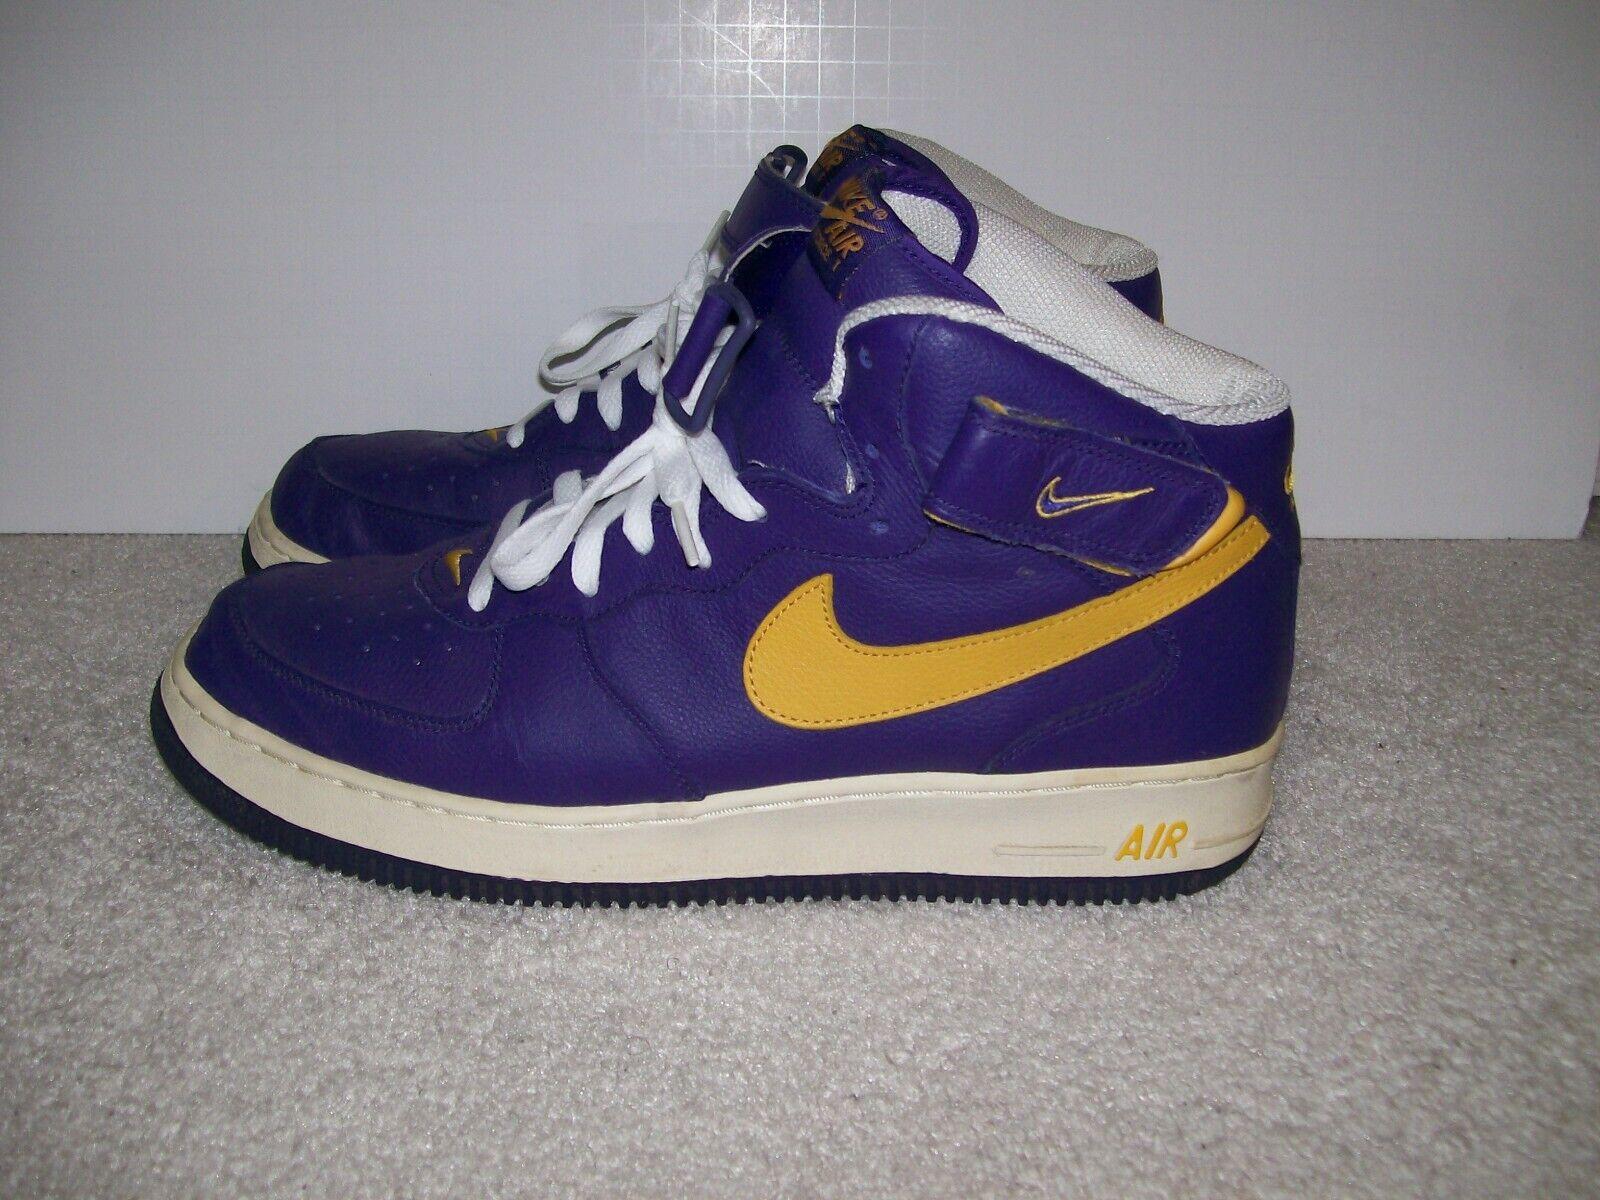 Rare 02 SZ 13 Nike Air Force 1 I One AF1 Purple gold 624039-571 Lakers Kobe Zoom